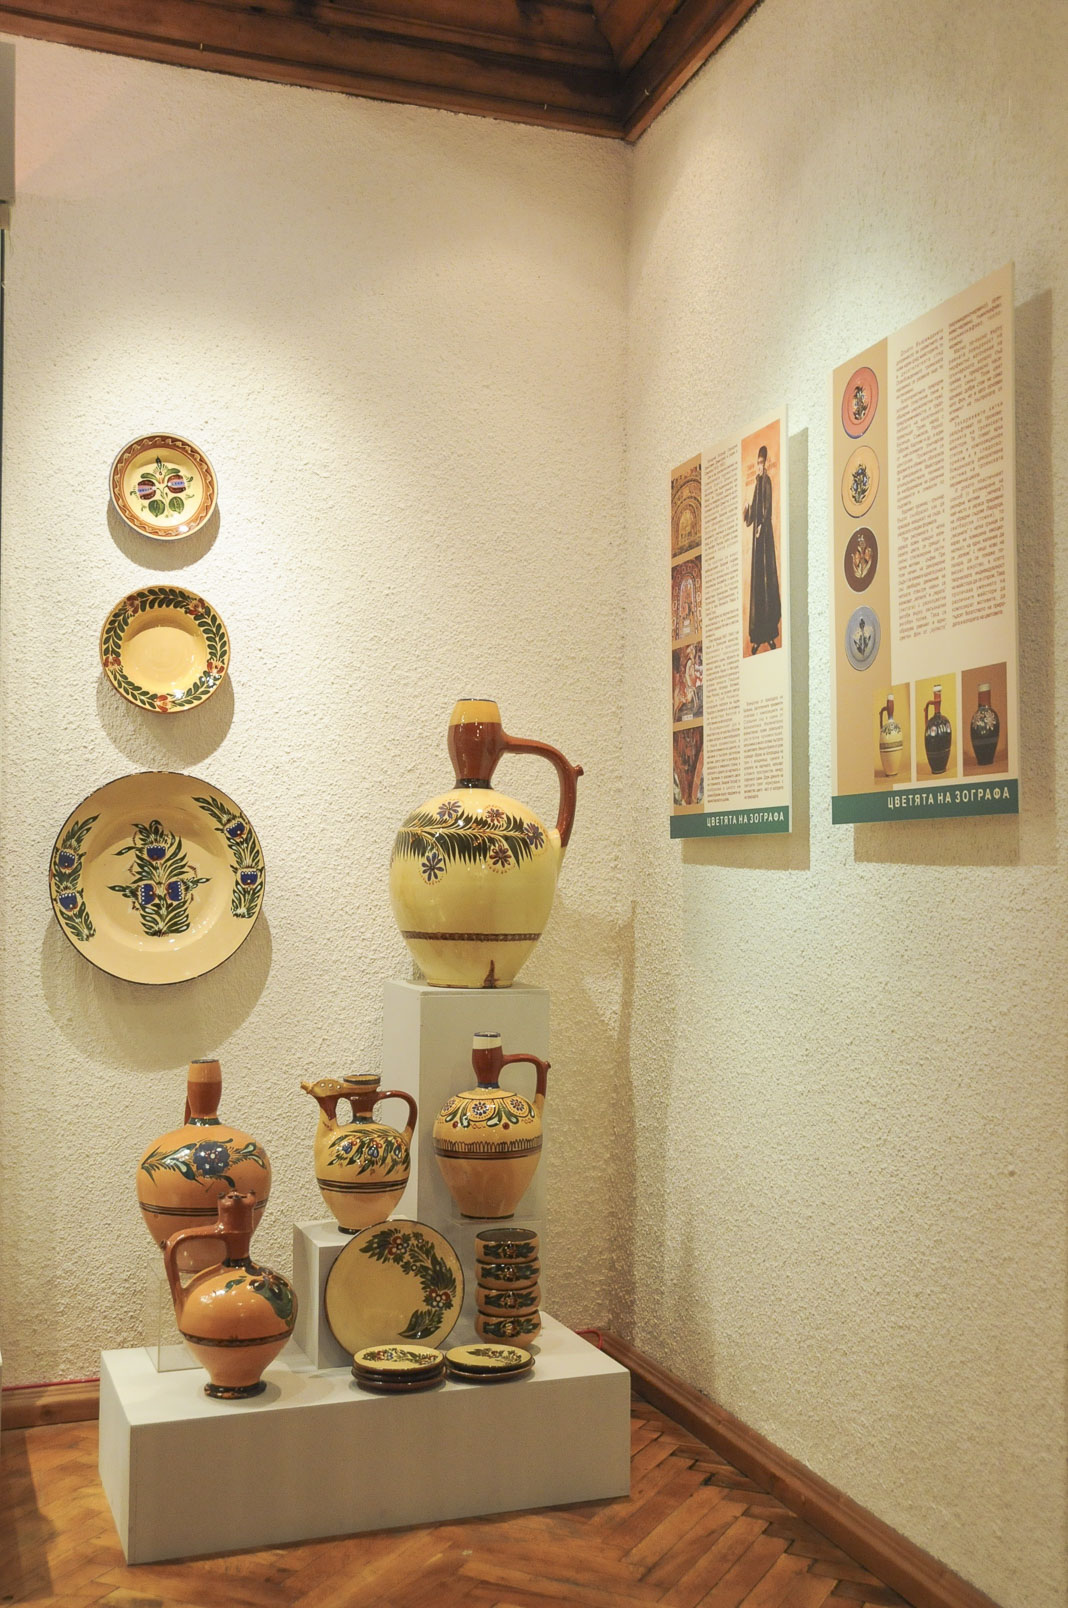 troyan-museum-cvetqta-na-zografa-10